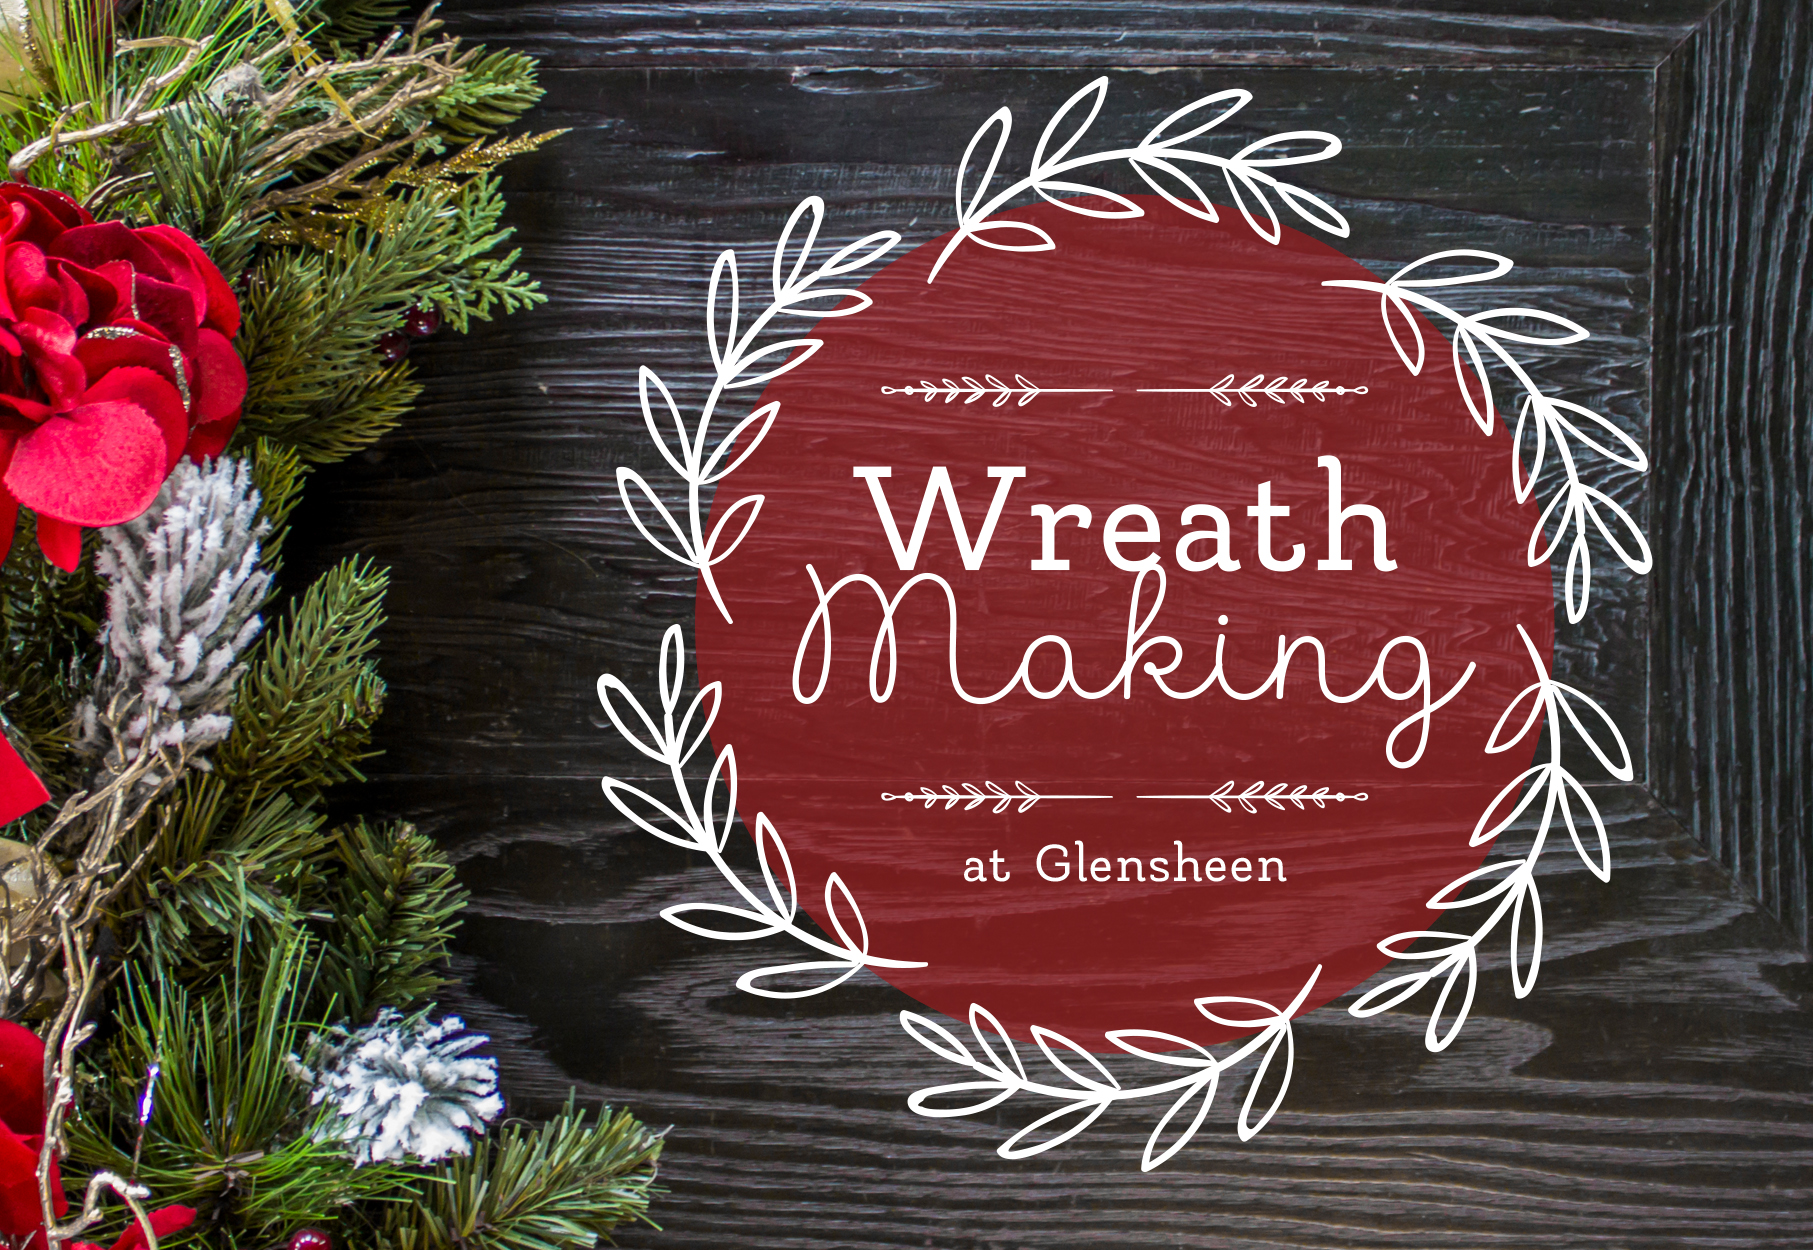 Wreath Making At Glensheen Glensheen